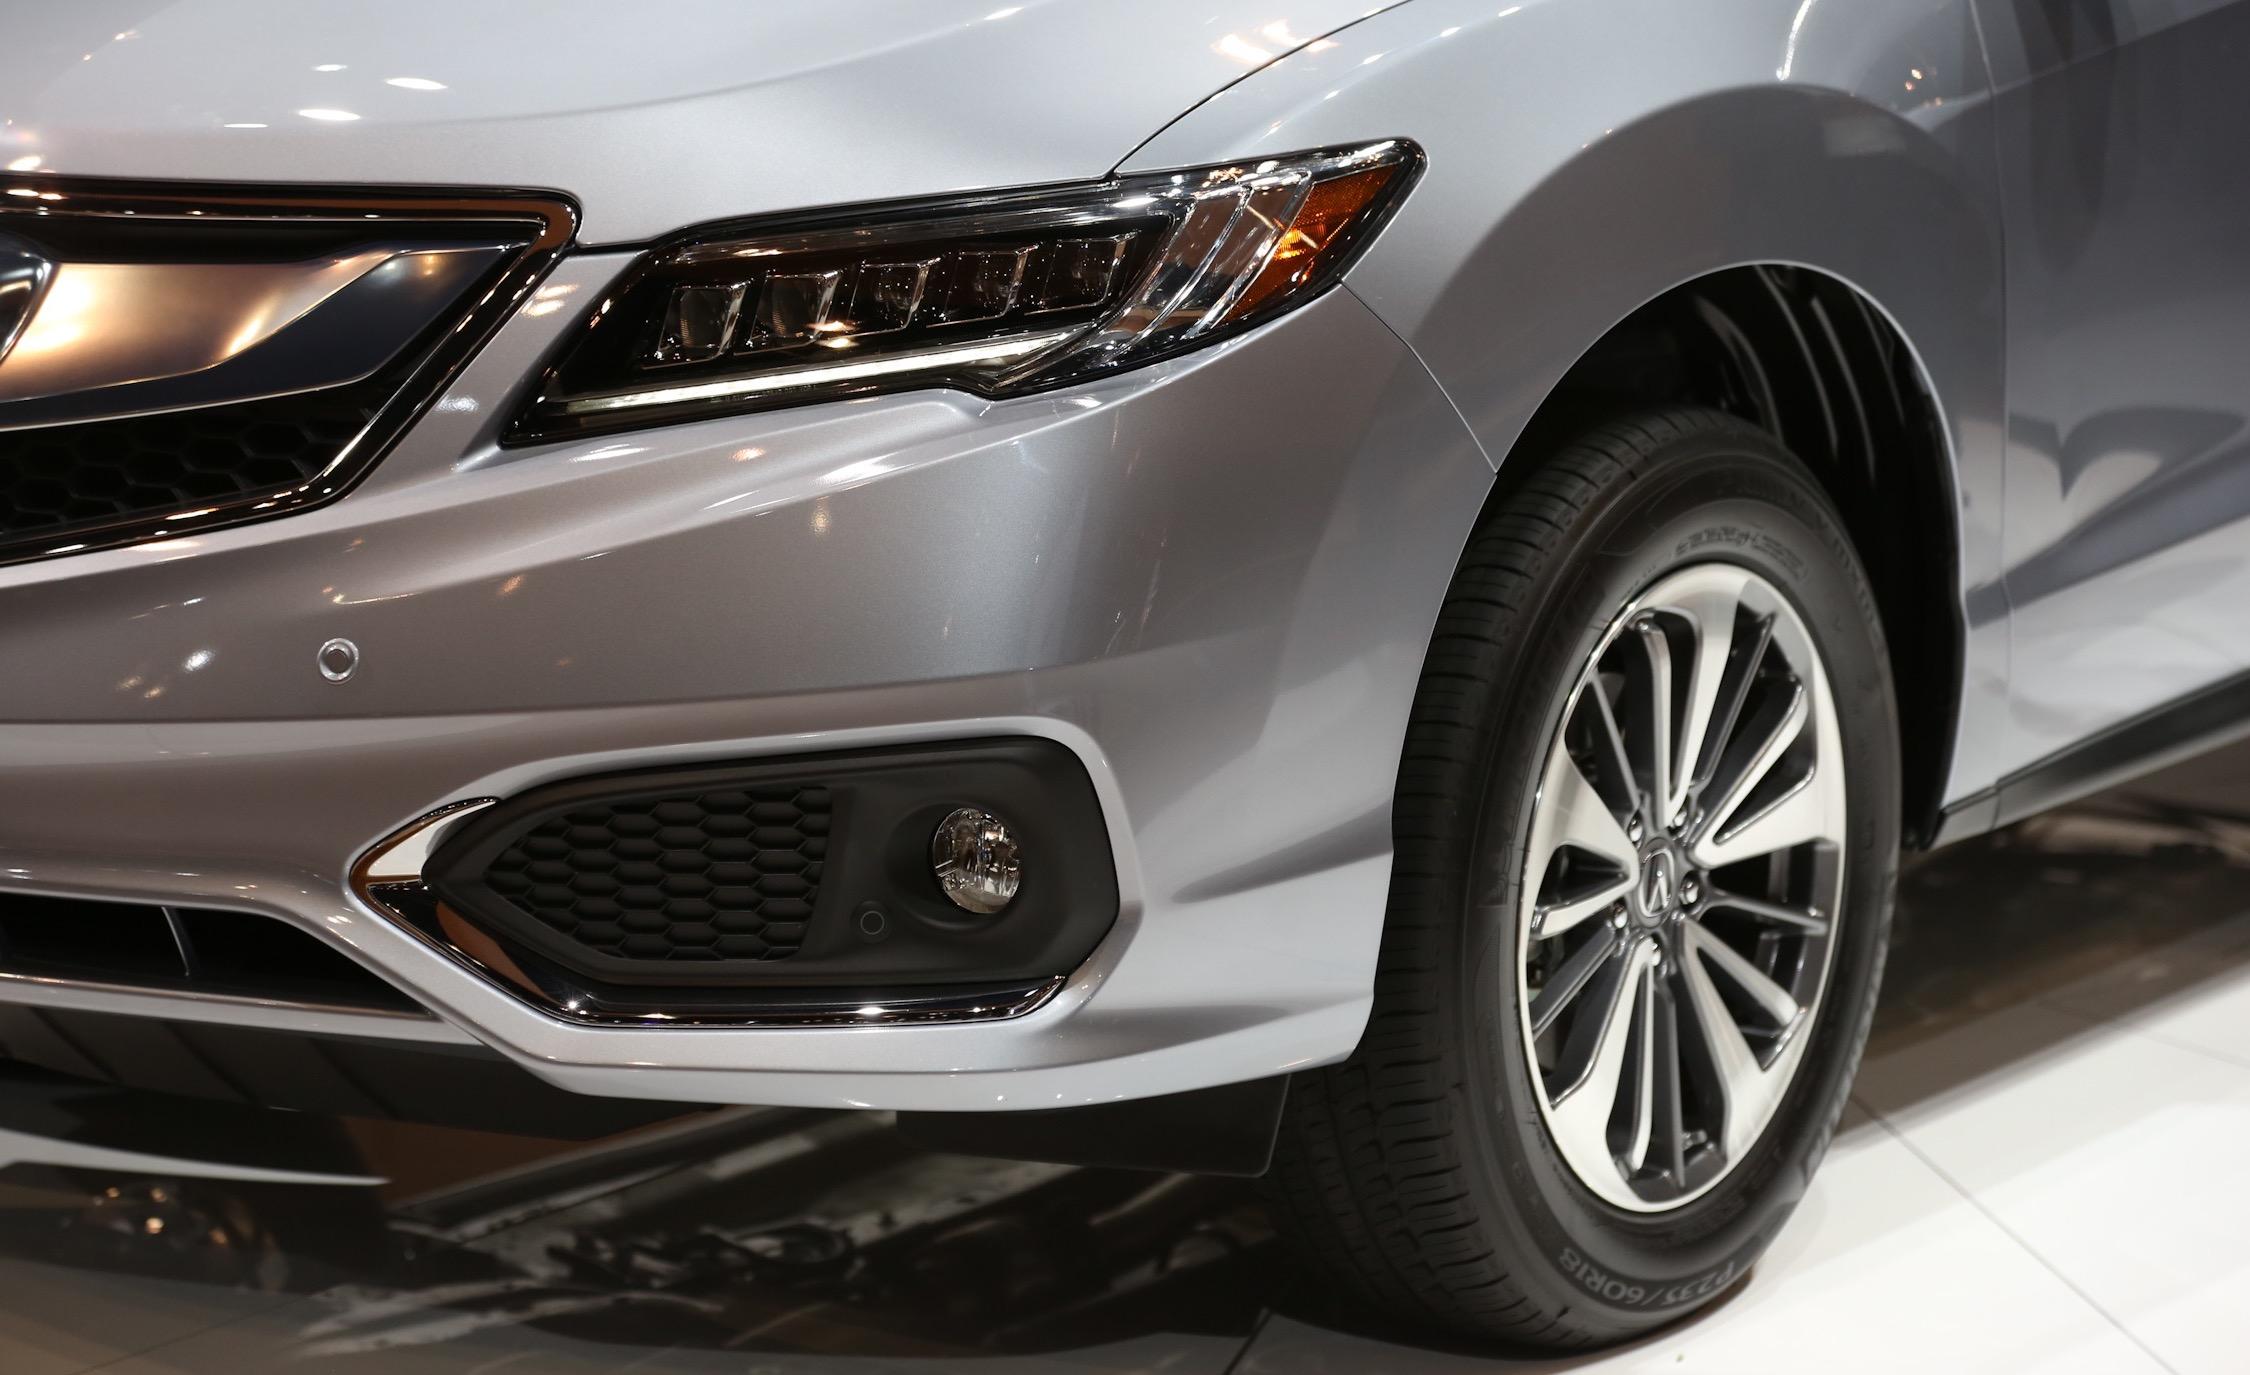 2016 Acura RDX Headlamp and Wheel Trim Preview